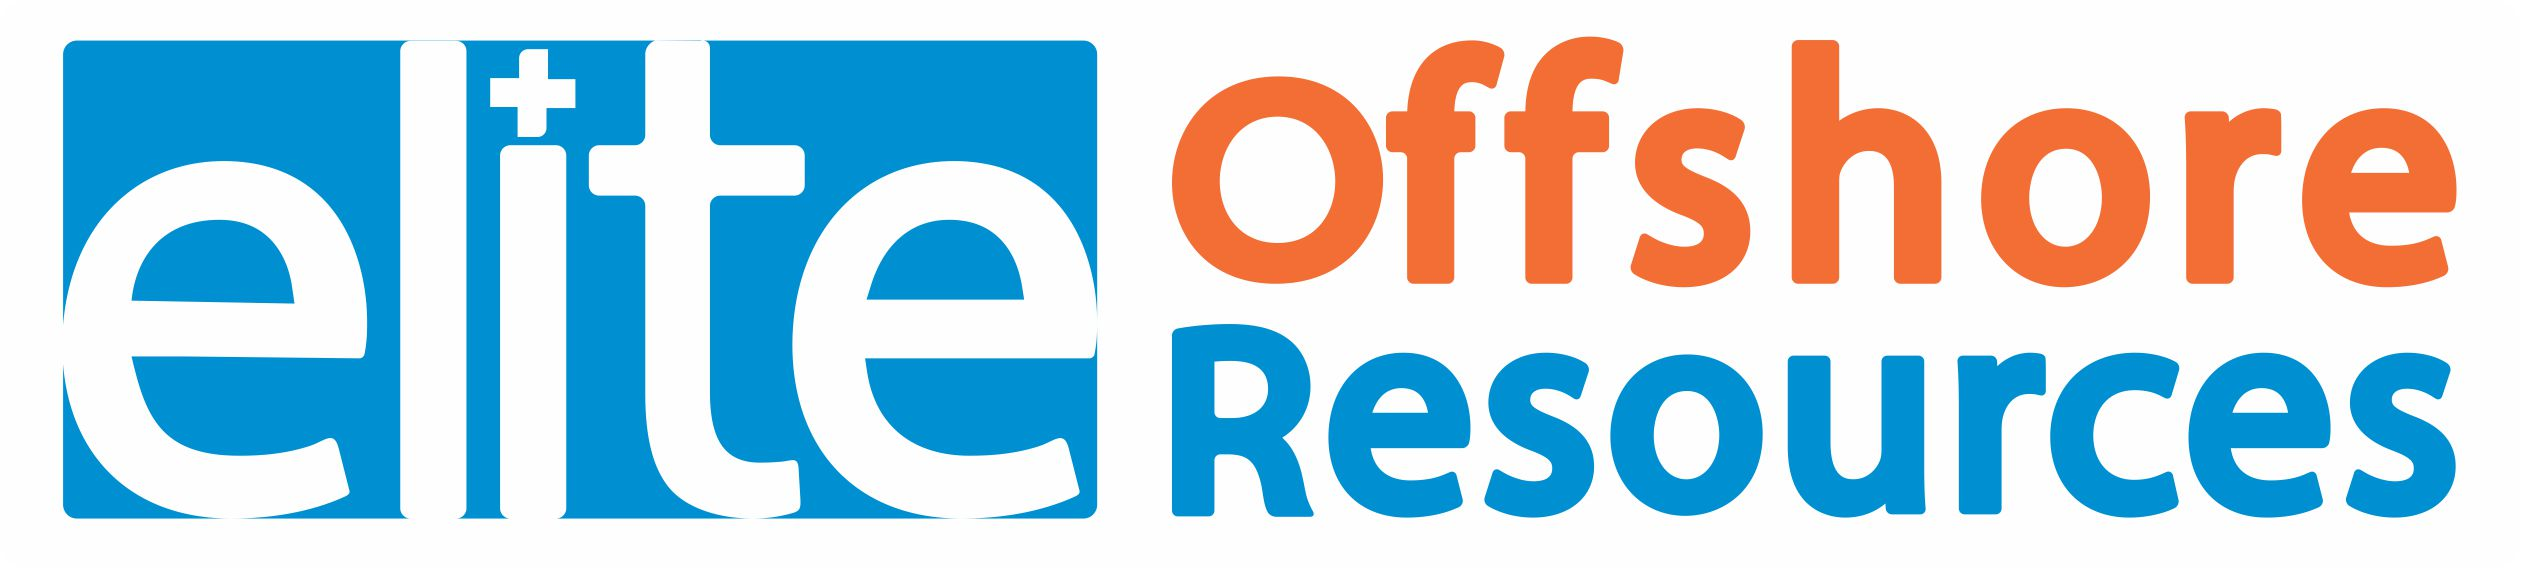 Elite Offshore Resources